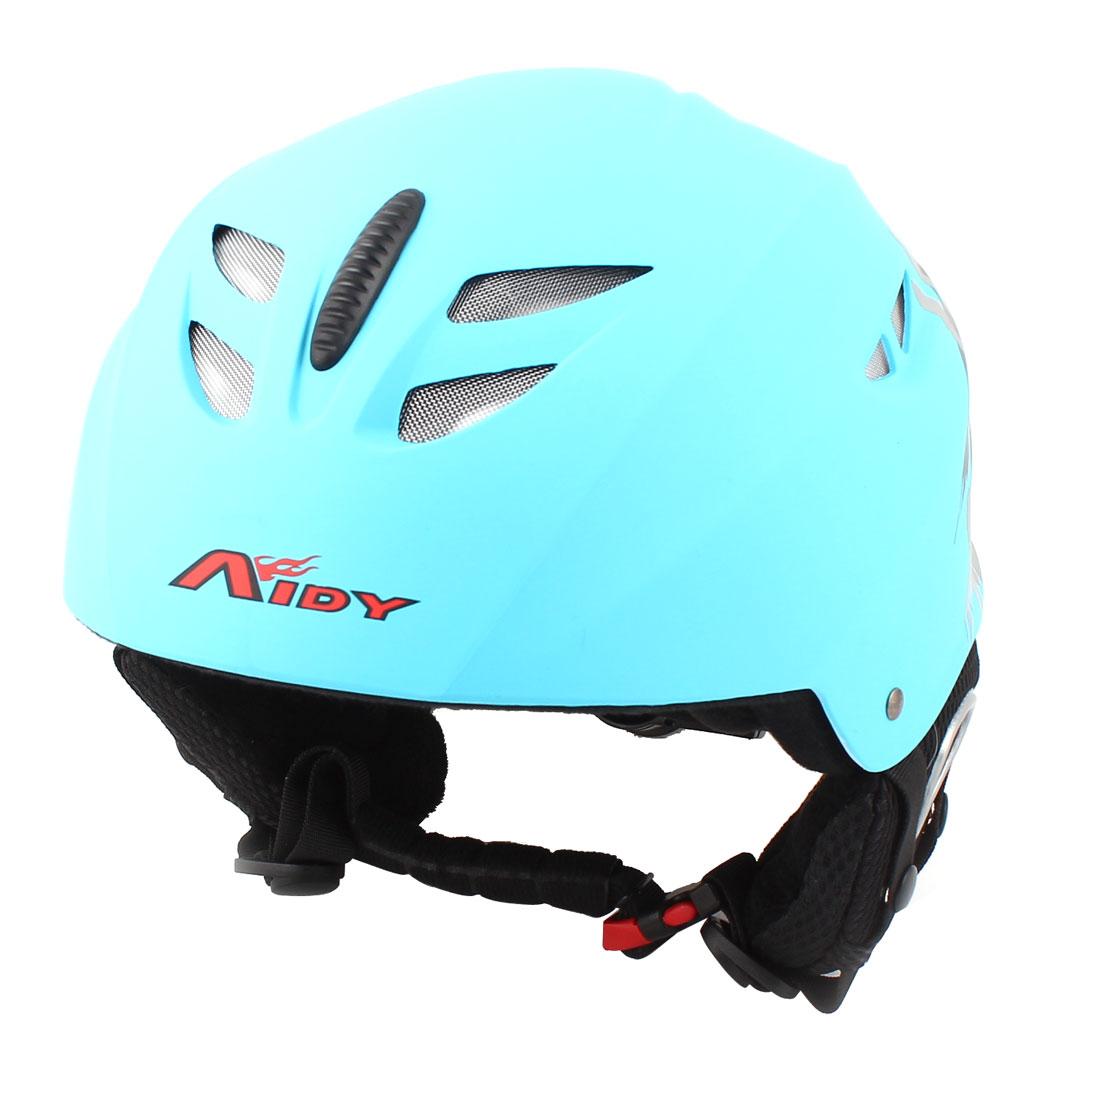 Adults Hand Printed Sponge Earflap Skiing Protective Helmet Blue